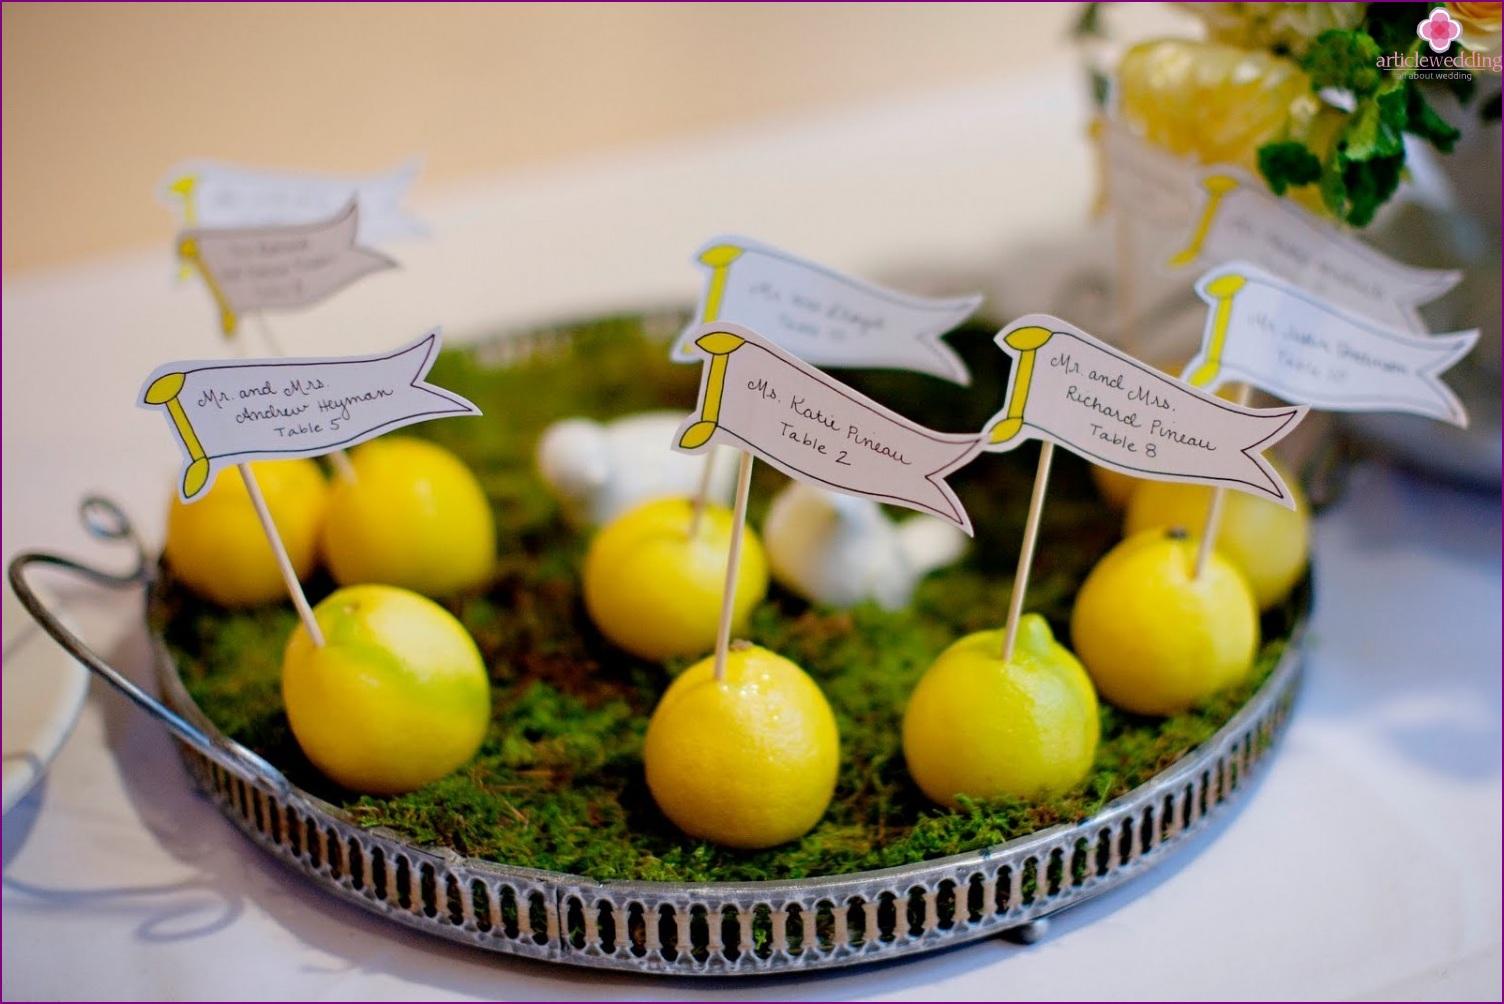 Banquet cards of lemons